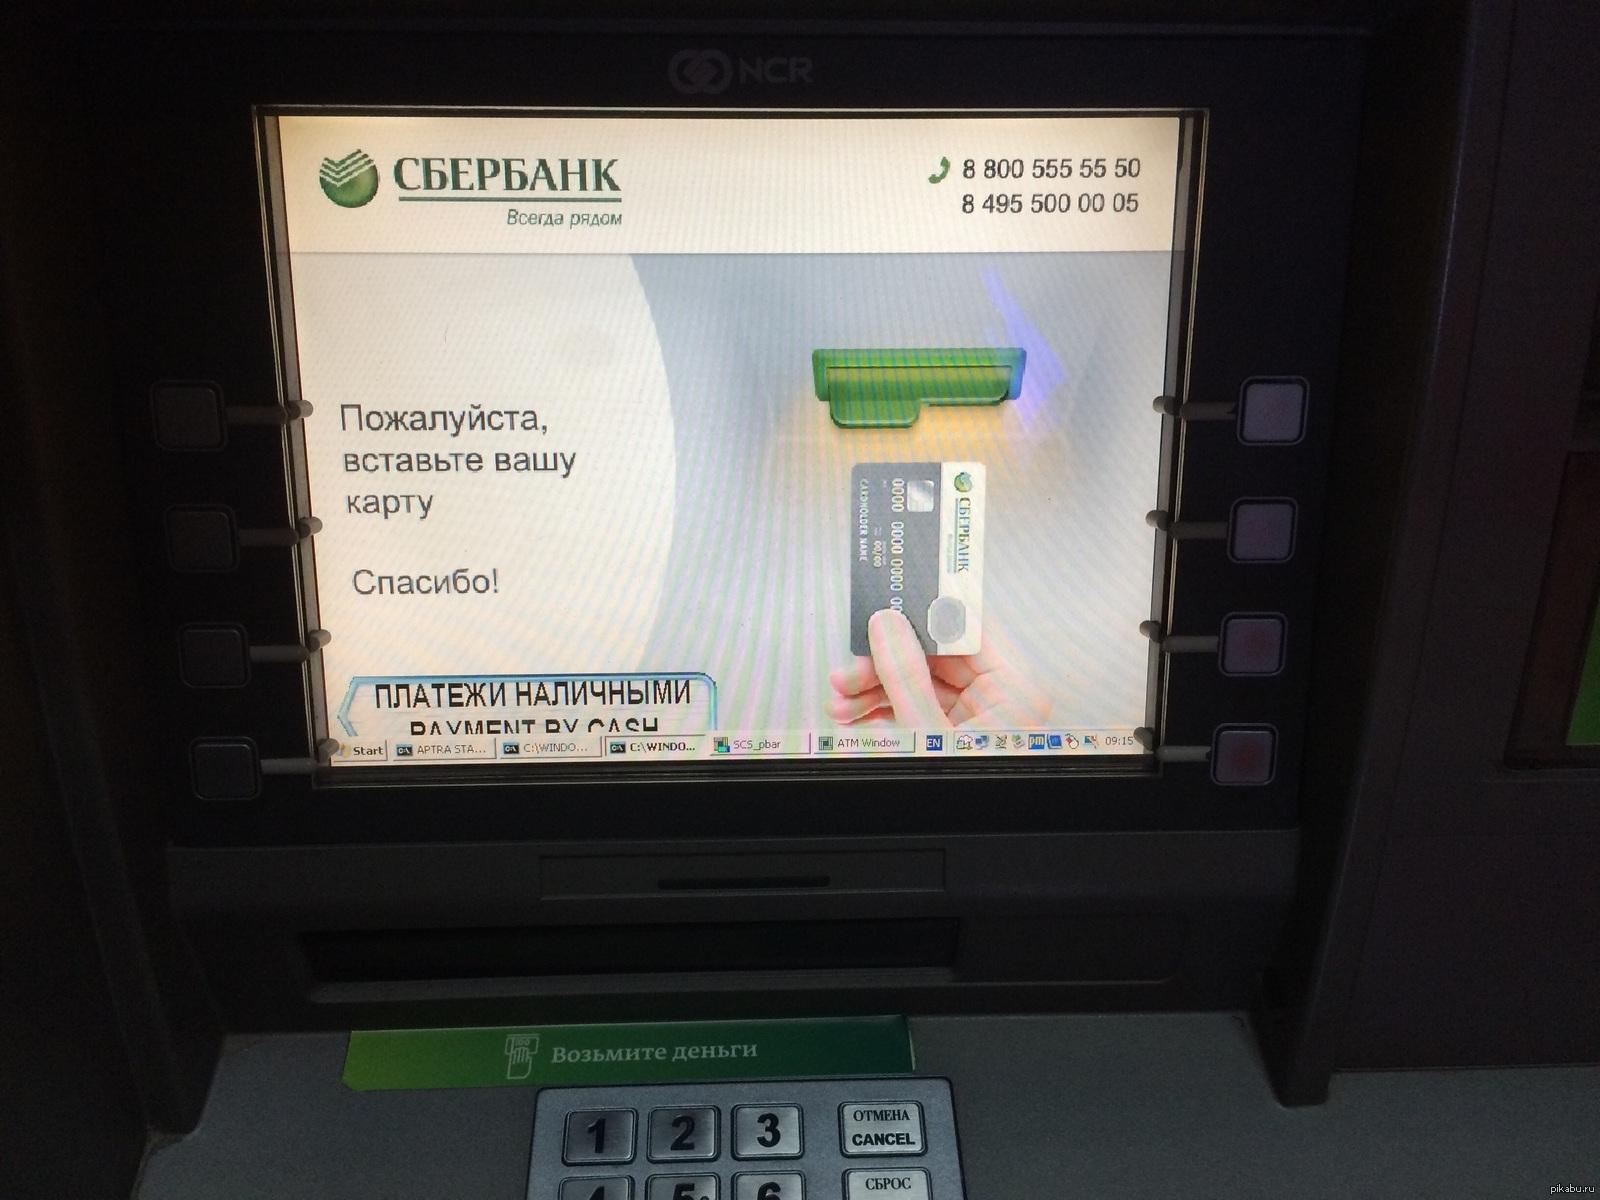 Картинка главное меню банкомата